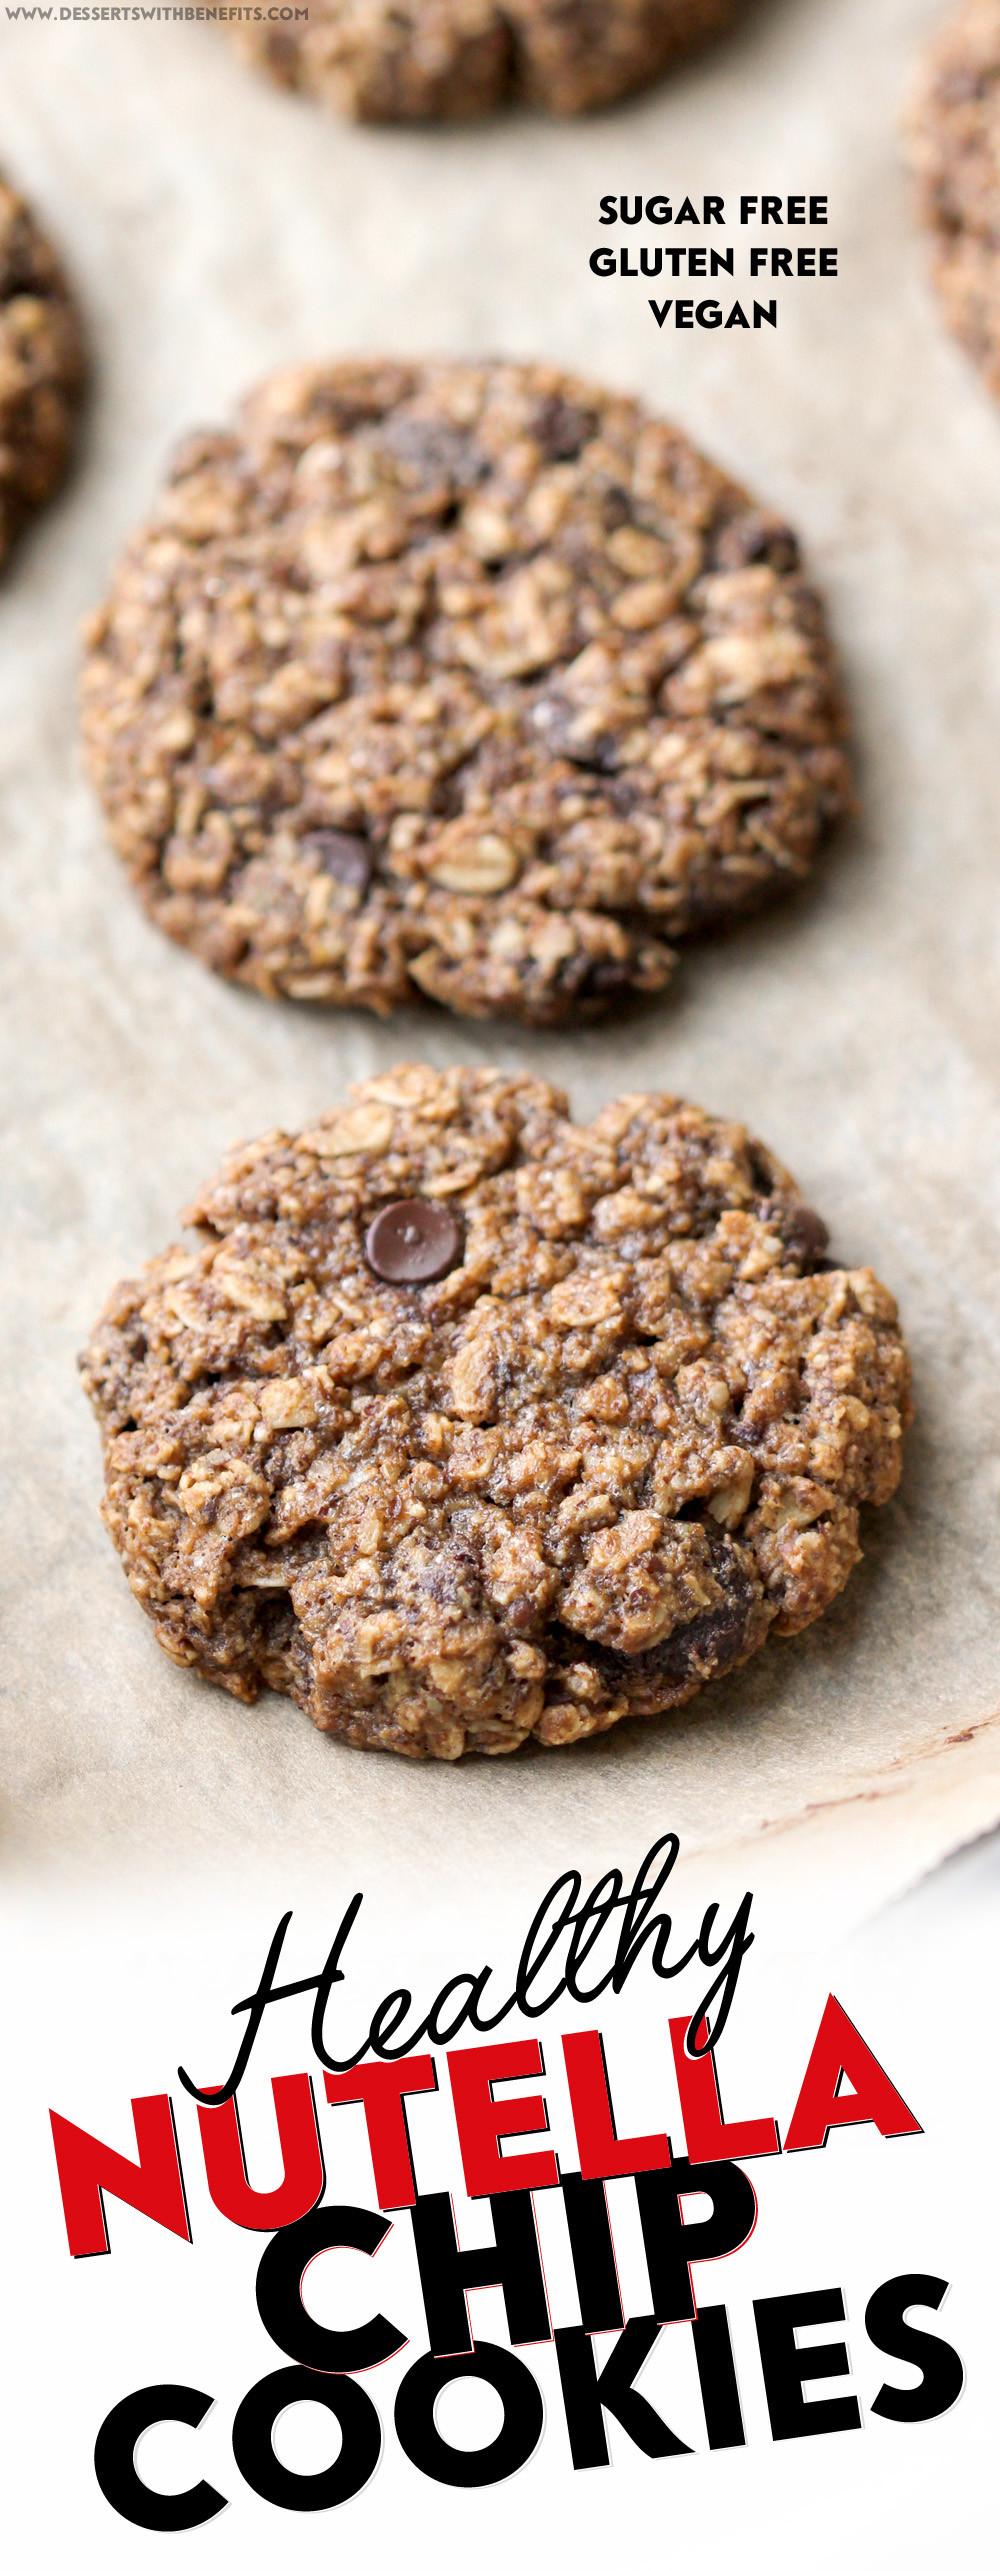 Healthy Gluten Free Oatmeal Cookies  Healthy Nutella Chip Oatmeal Cookies recipe gluten free